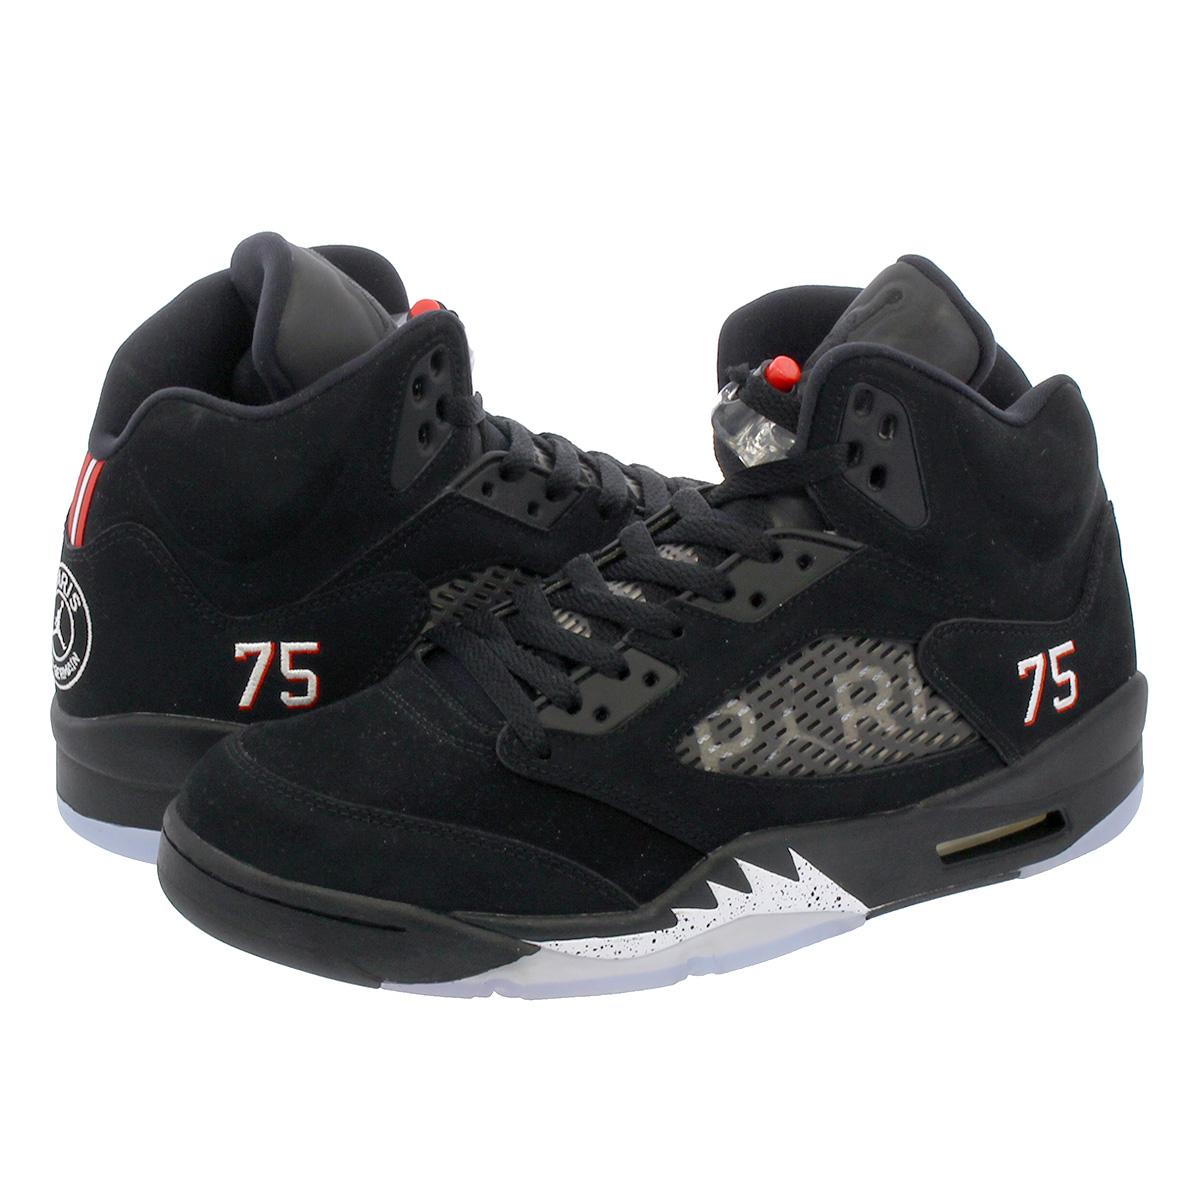 9ca137bad3ae0 NIKE AIR JORDAN 5 RETRO BCFC Nike Air Jordan 5 nostalgic  BLACK/WHITE/CHALLENGE ...